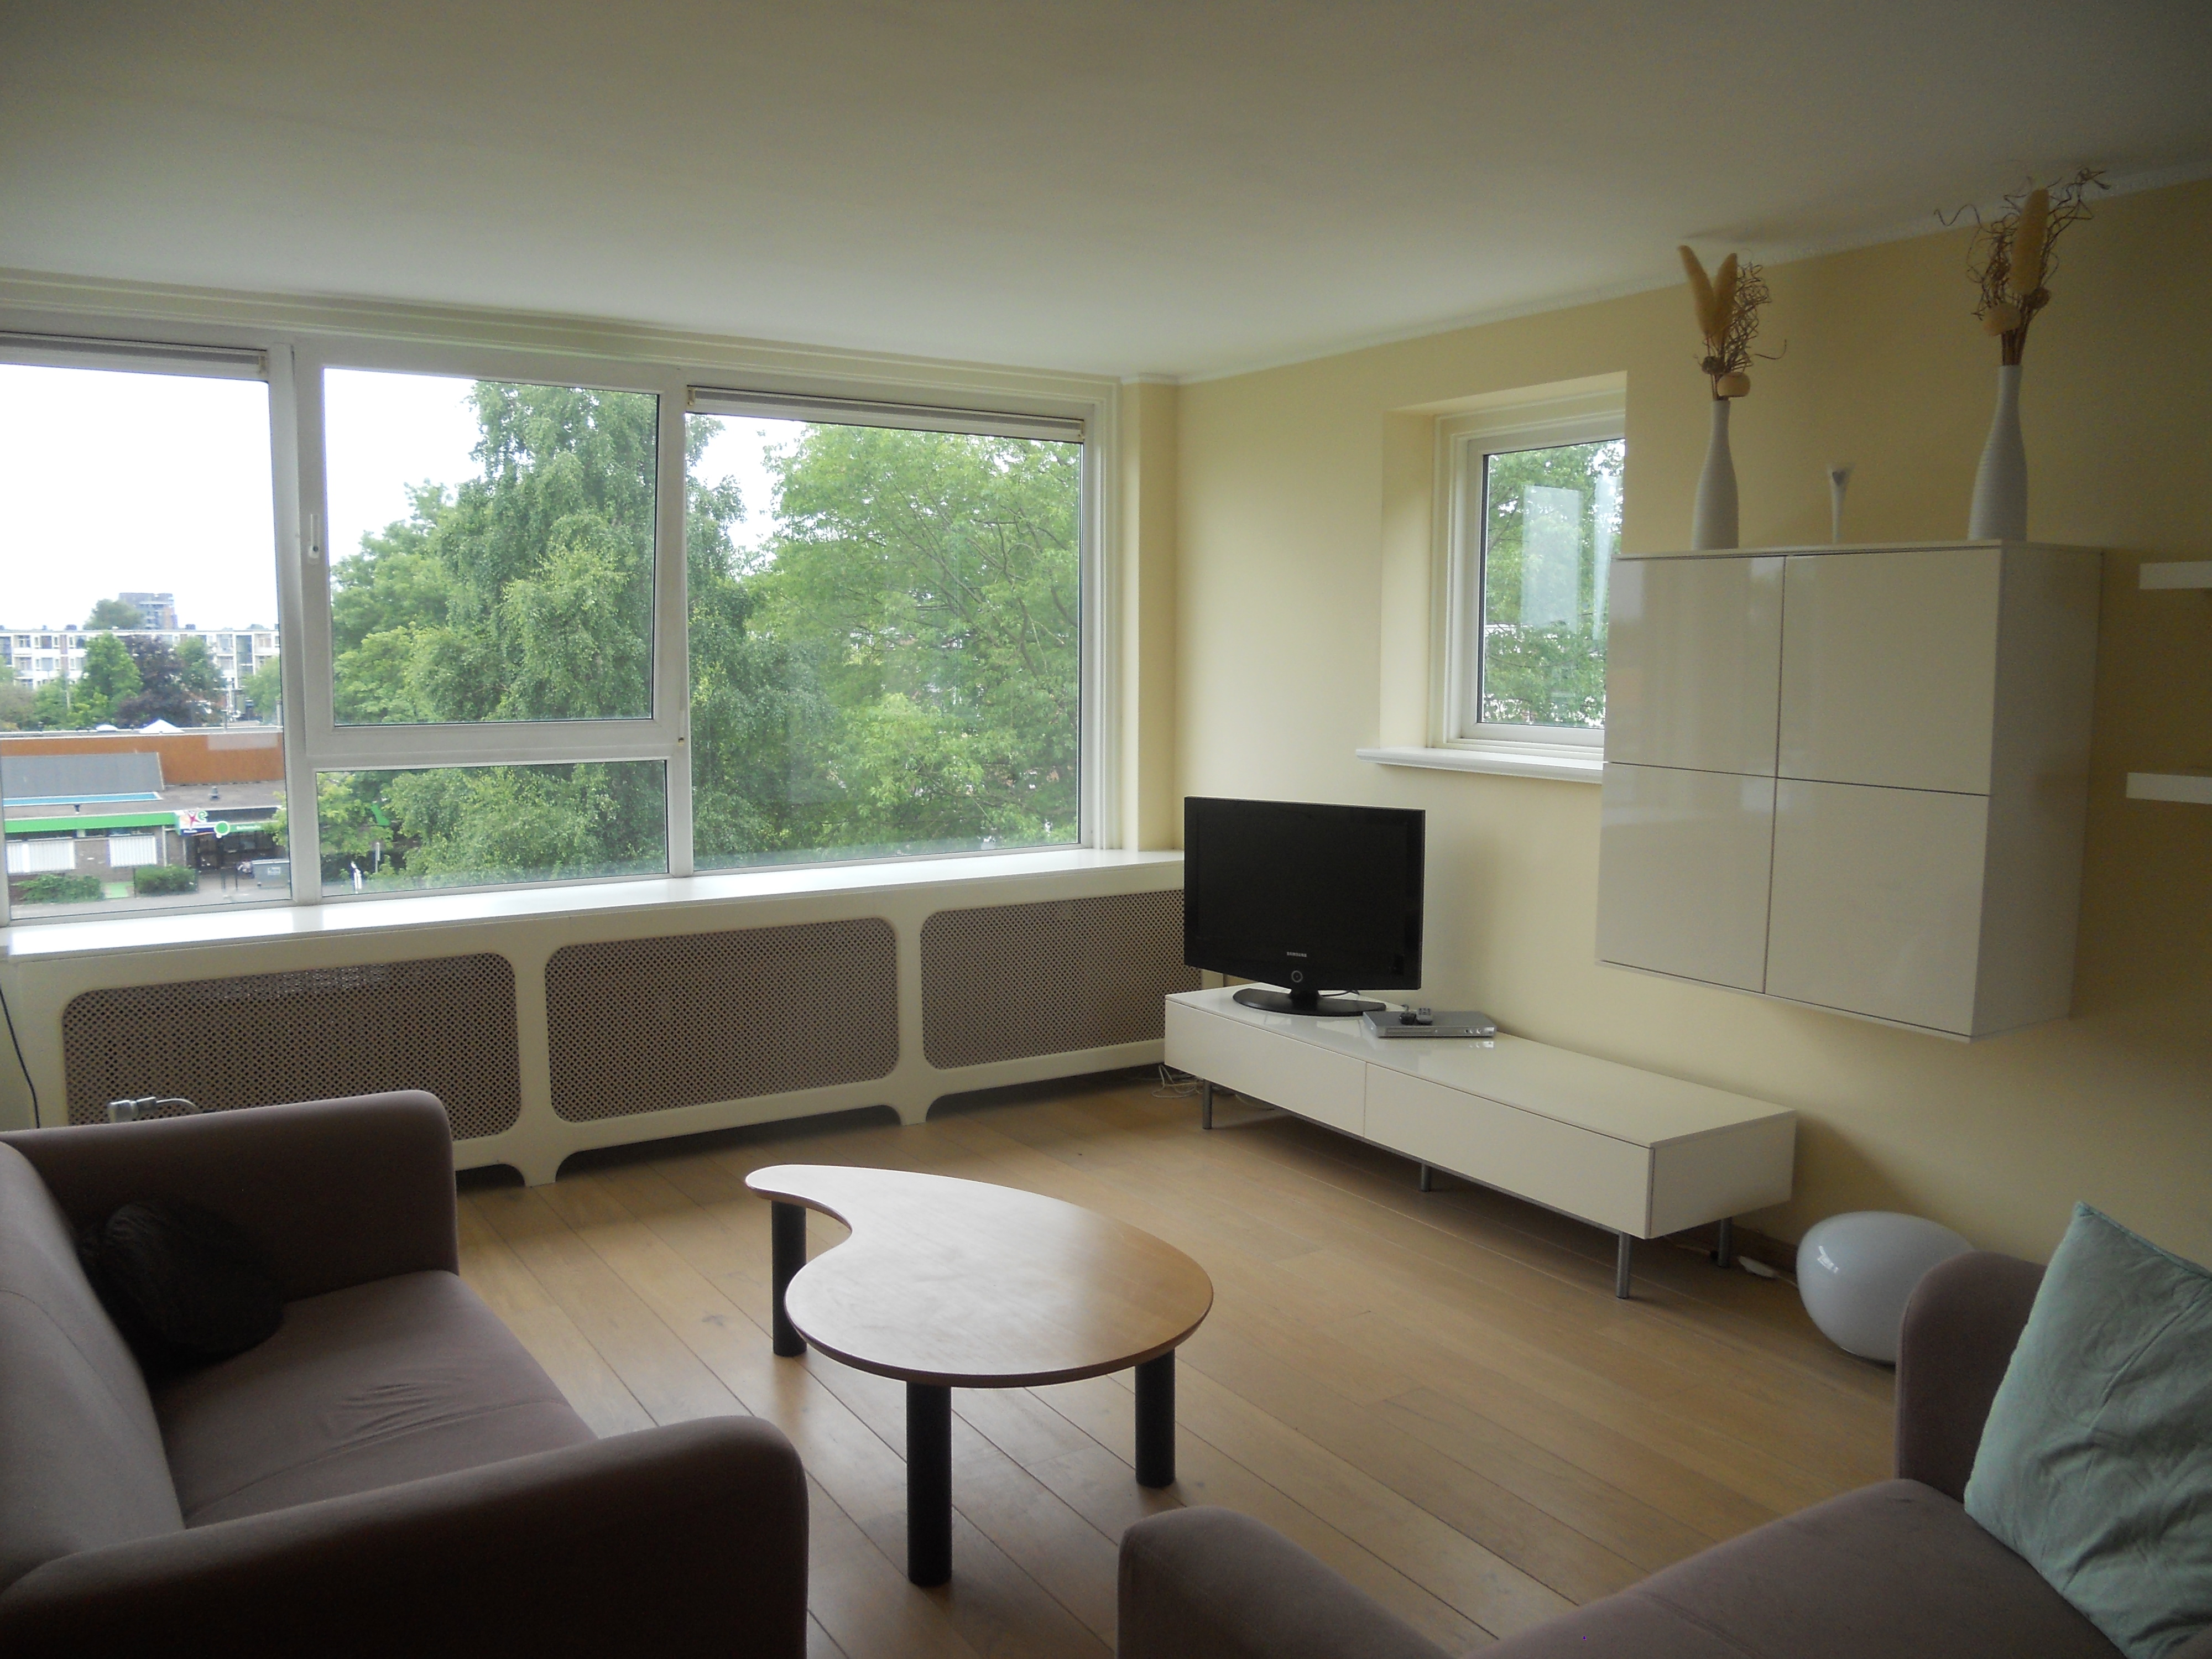 2017 2 Bedroom Apartment Near The University Of Twente